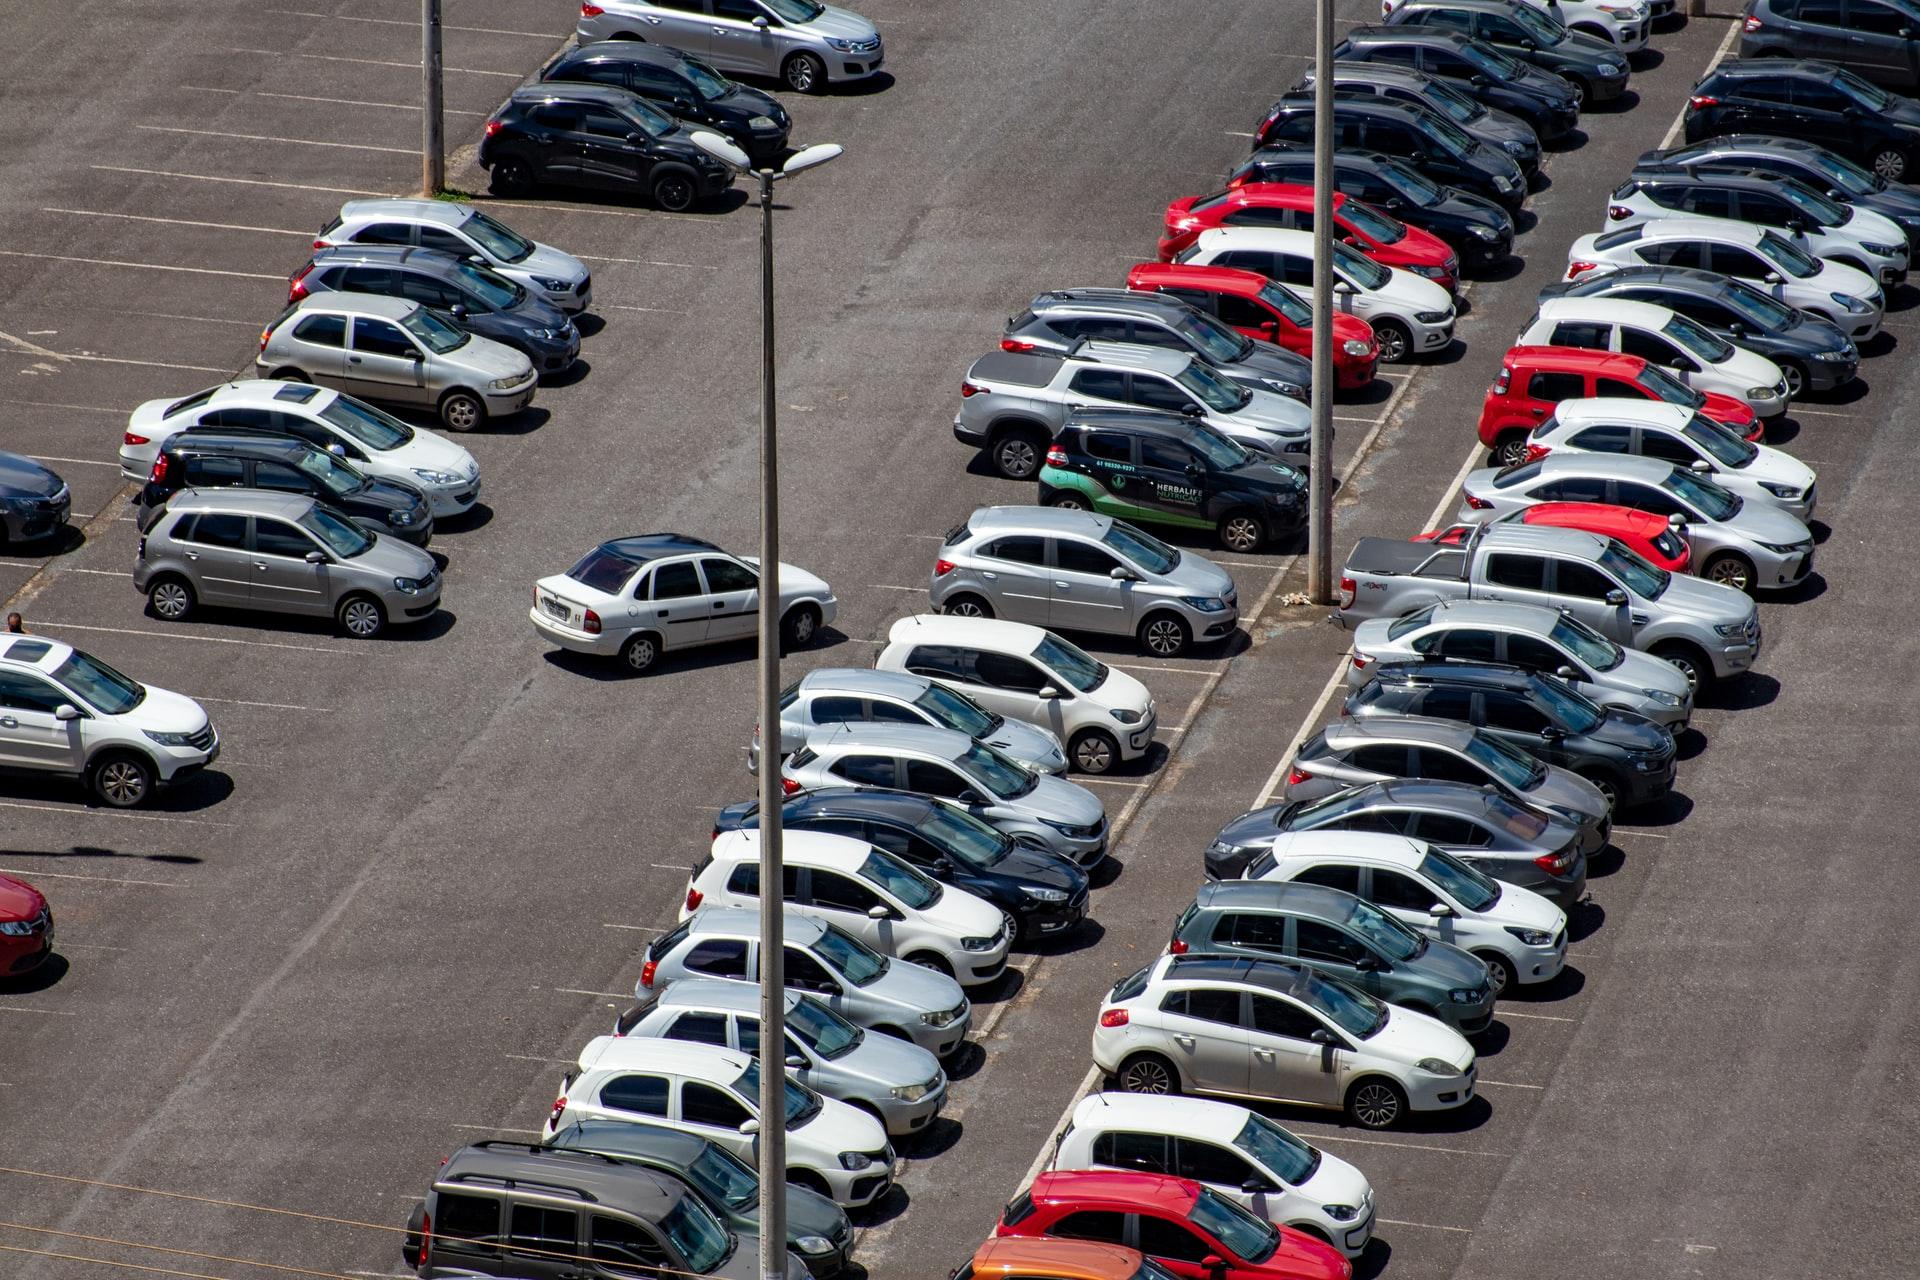 Cars parking, parking spaces